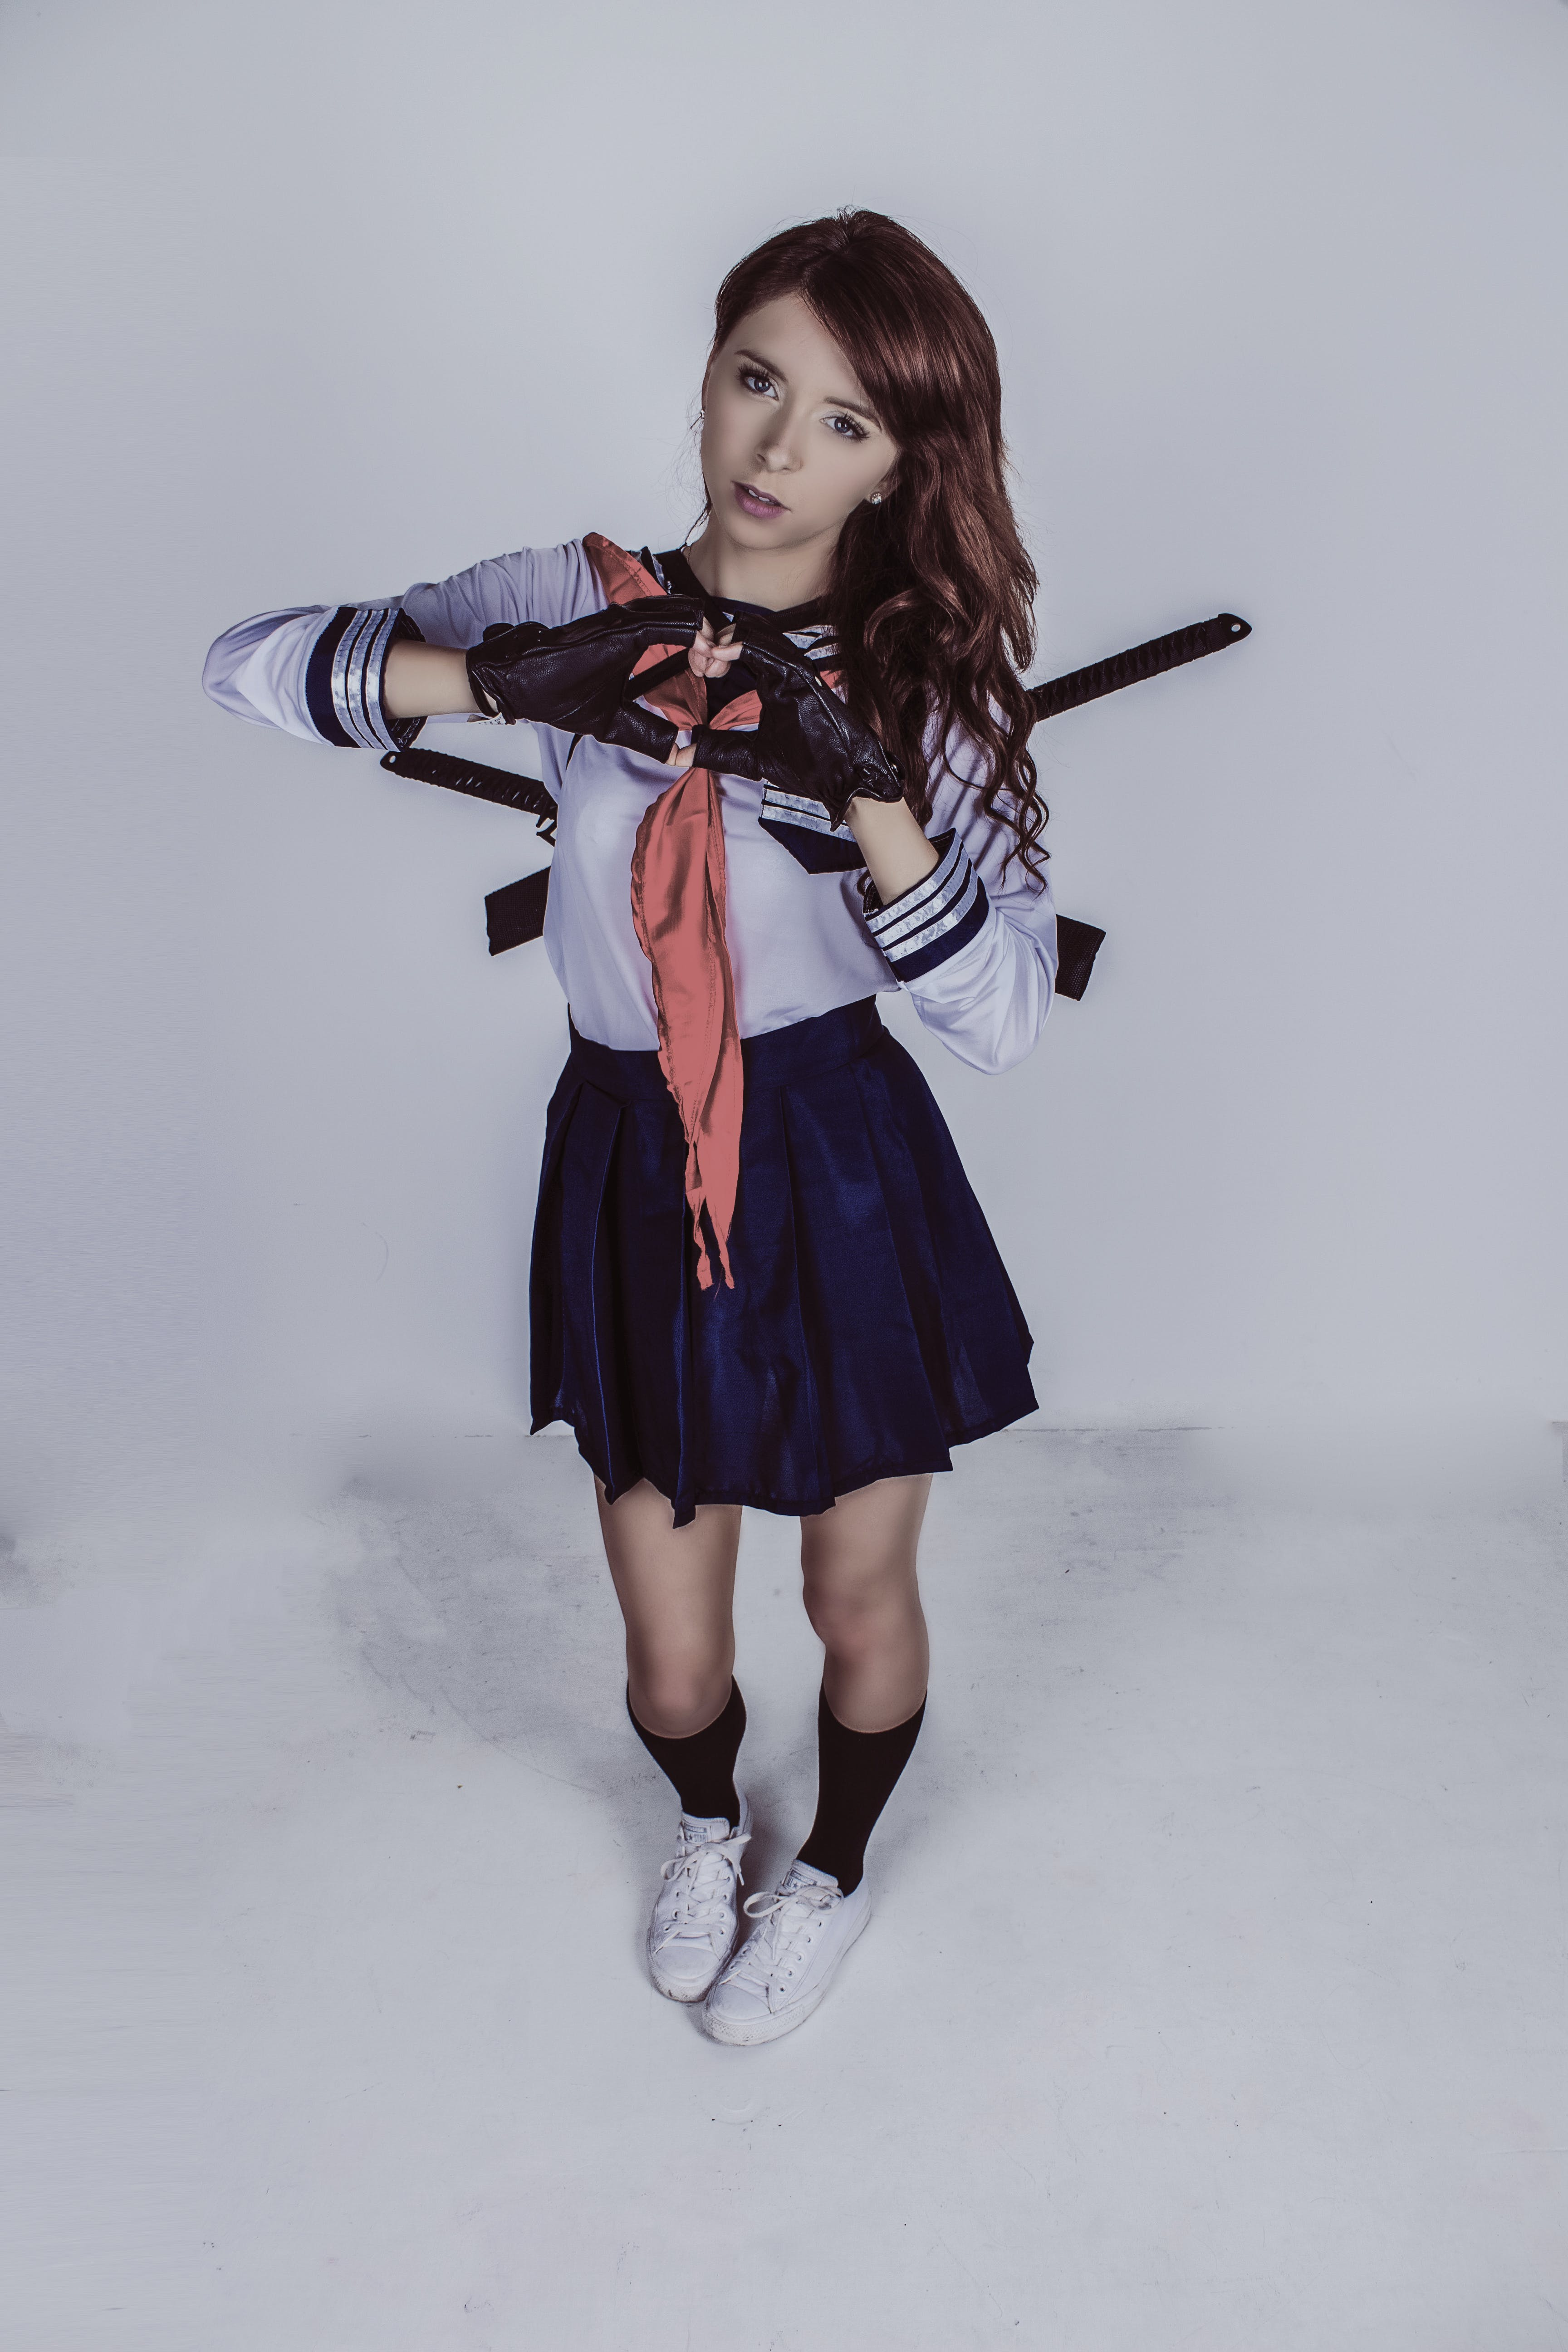 Free stock photo of cosplay, girl, school girl uniform, standing